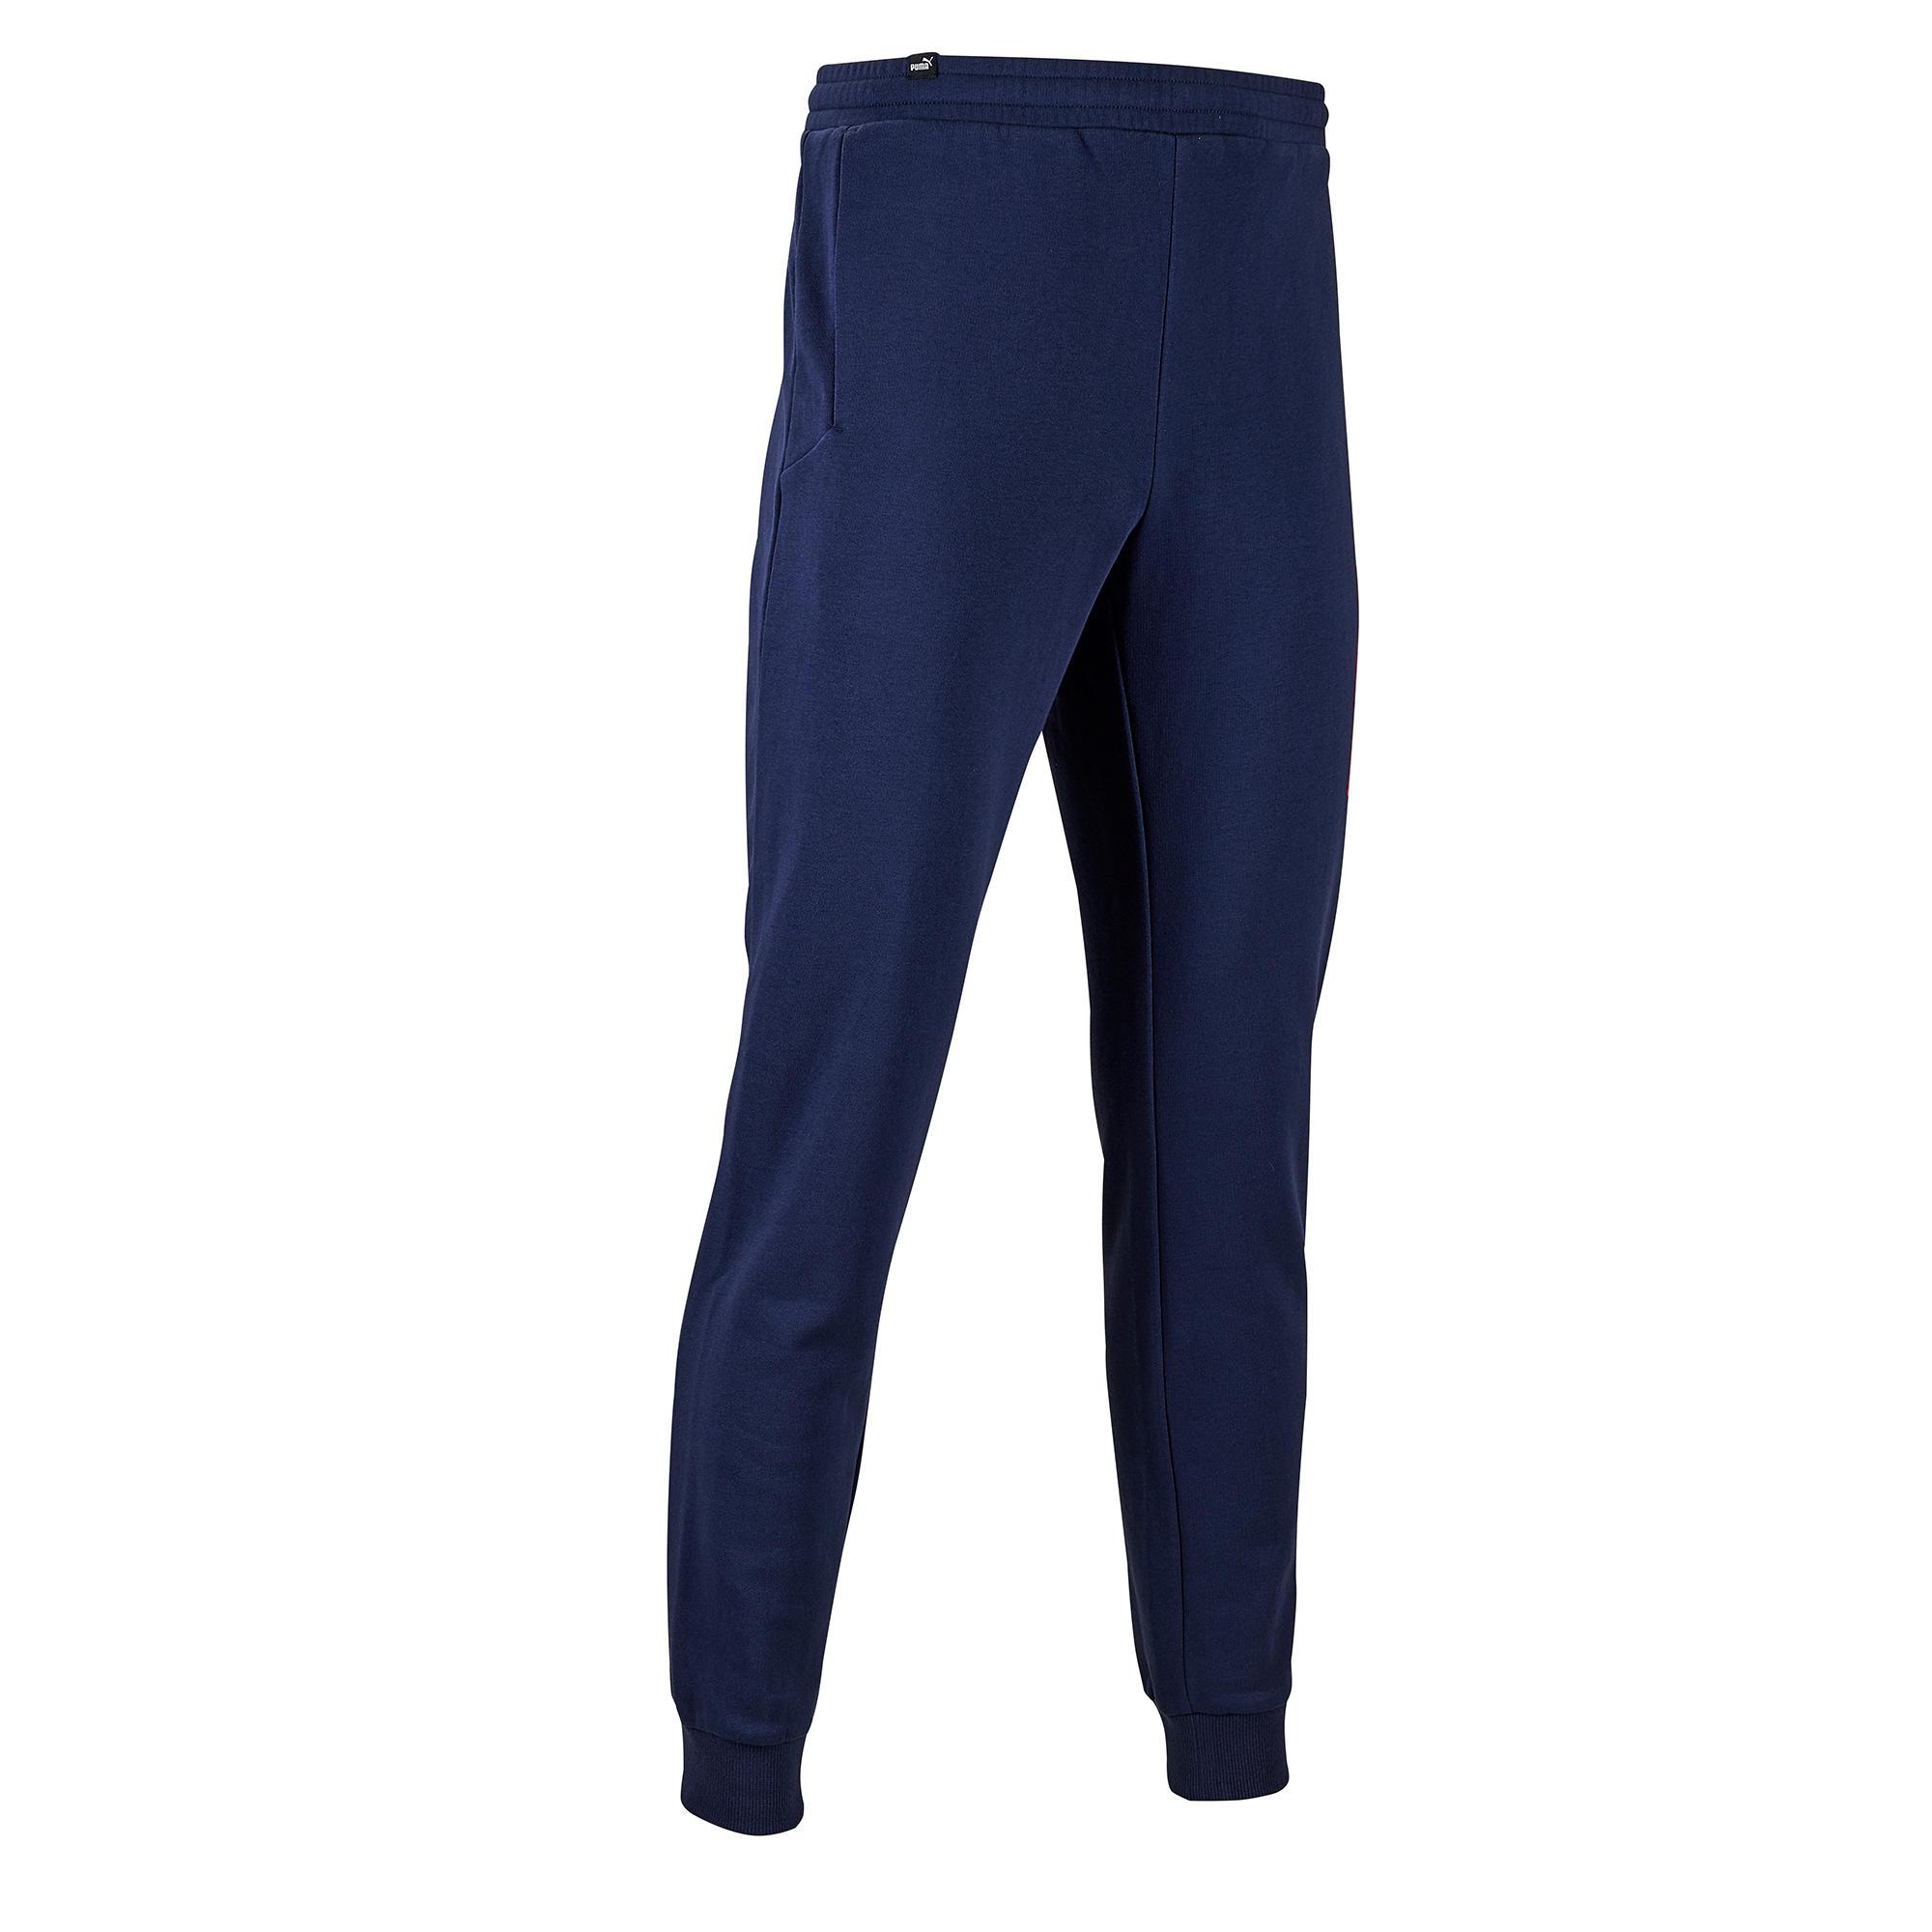 Pantalon PUMA 500 bărbați imagine